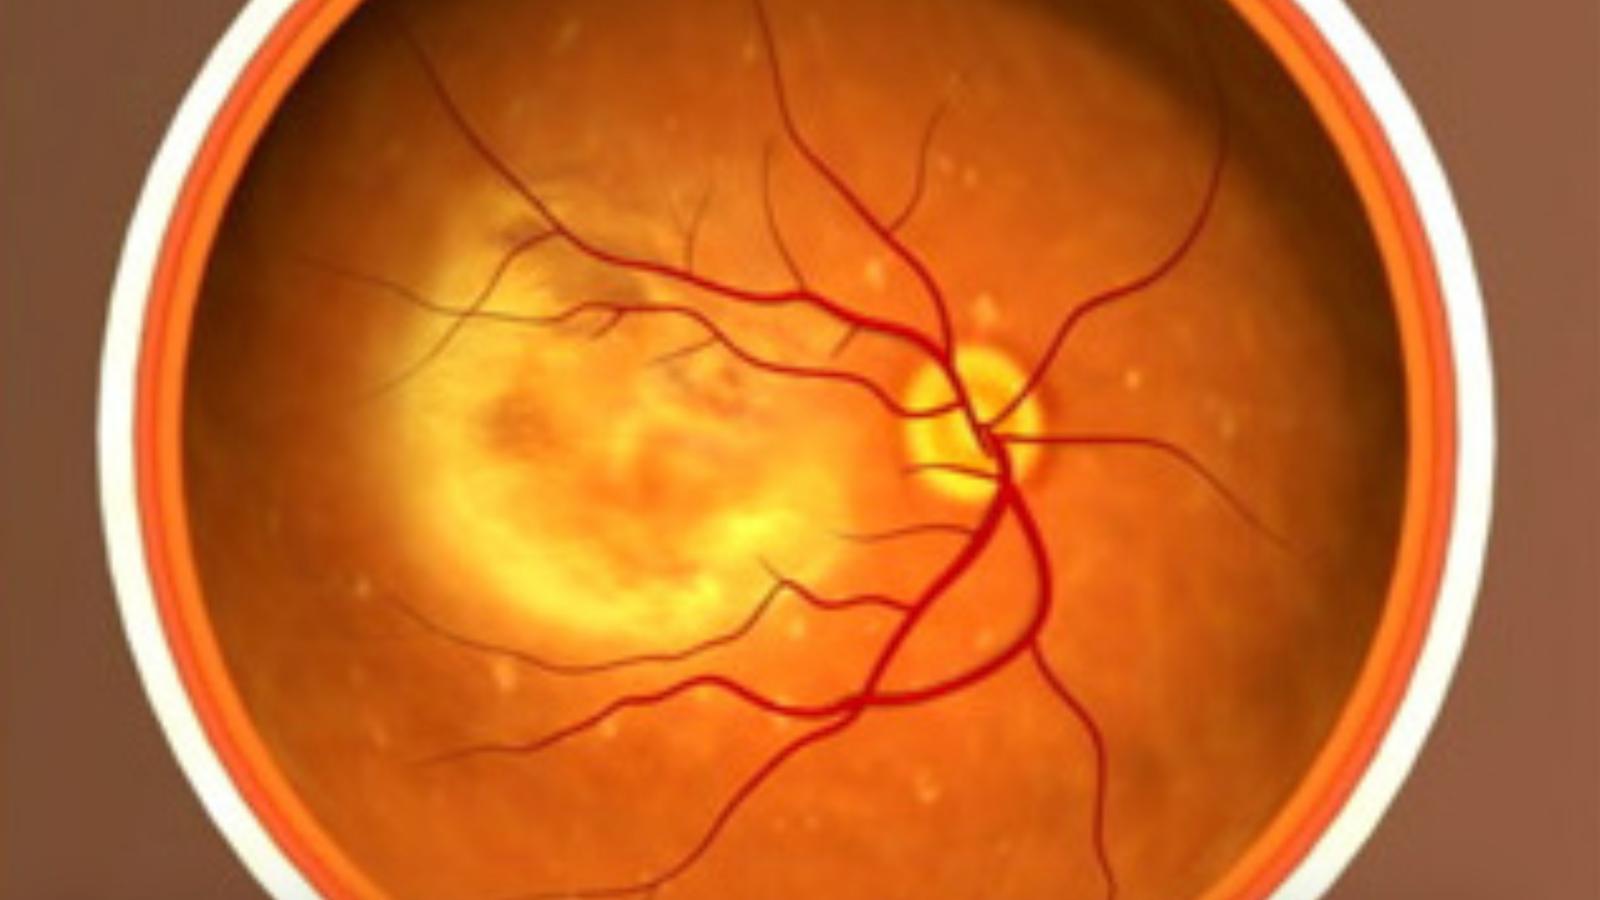 Uk Doctors Used Stem Cells To Restore Eyesight In Two People